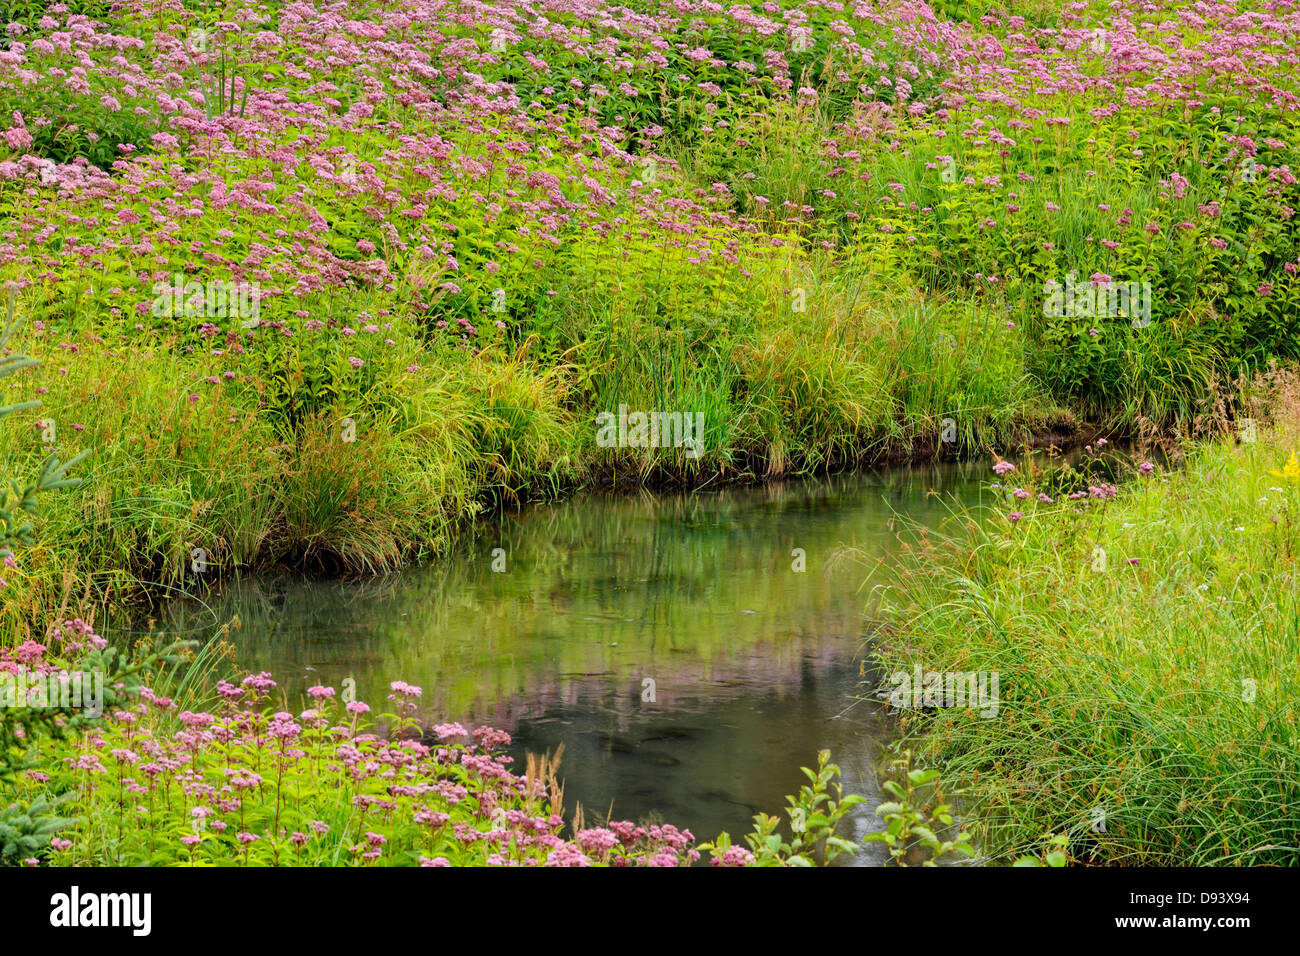 Flowering Joe-pye weed colony and spruces near a small stream Greater Sudbury Naughton Ontario Canada - Stock Image